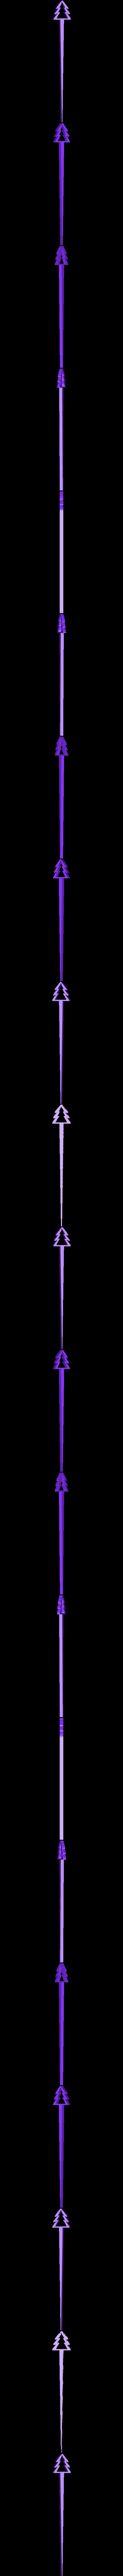 pine_tree_pick_3dprintny.stl Download free STL file Holiday Party Picks and Swizzle Sticks • 3D print model, barb_3dprintny